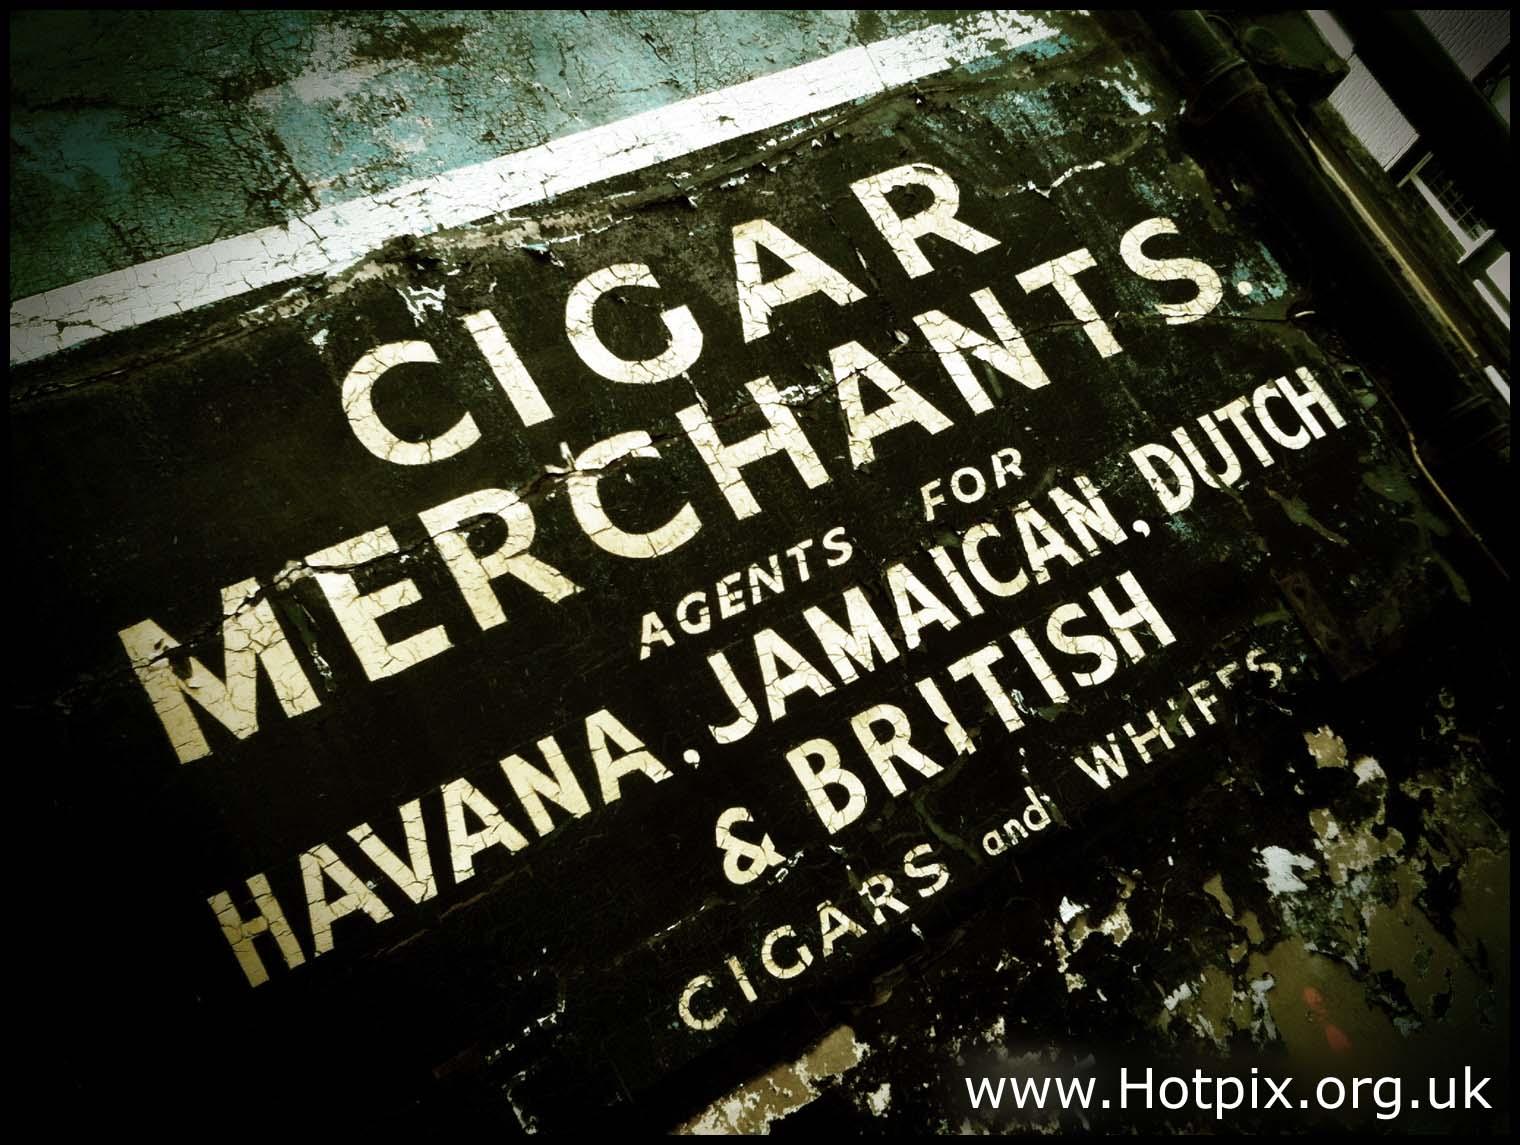 Northwich,ghost,sign,ghostsign,old,advertisment,cheshire,uk,england,britain,cigar,merchants,agents,for,havanna,jamaican,dutch,british,cigars,whifs,whiffs,lomo,holga,hotpix,hotpics,hot,pics,tonysmith